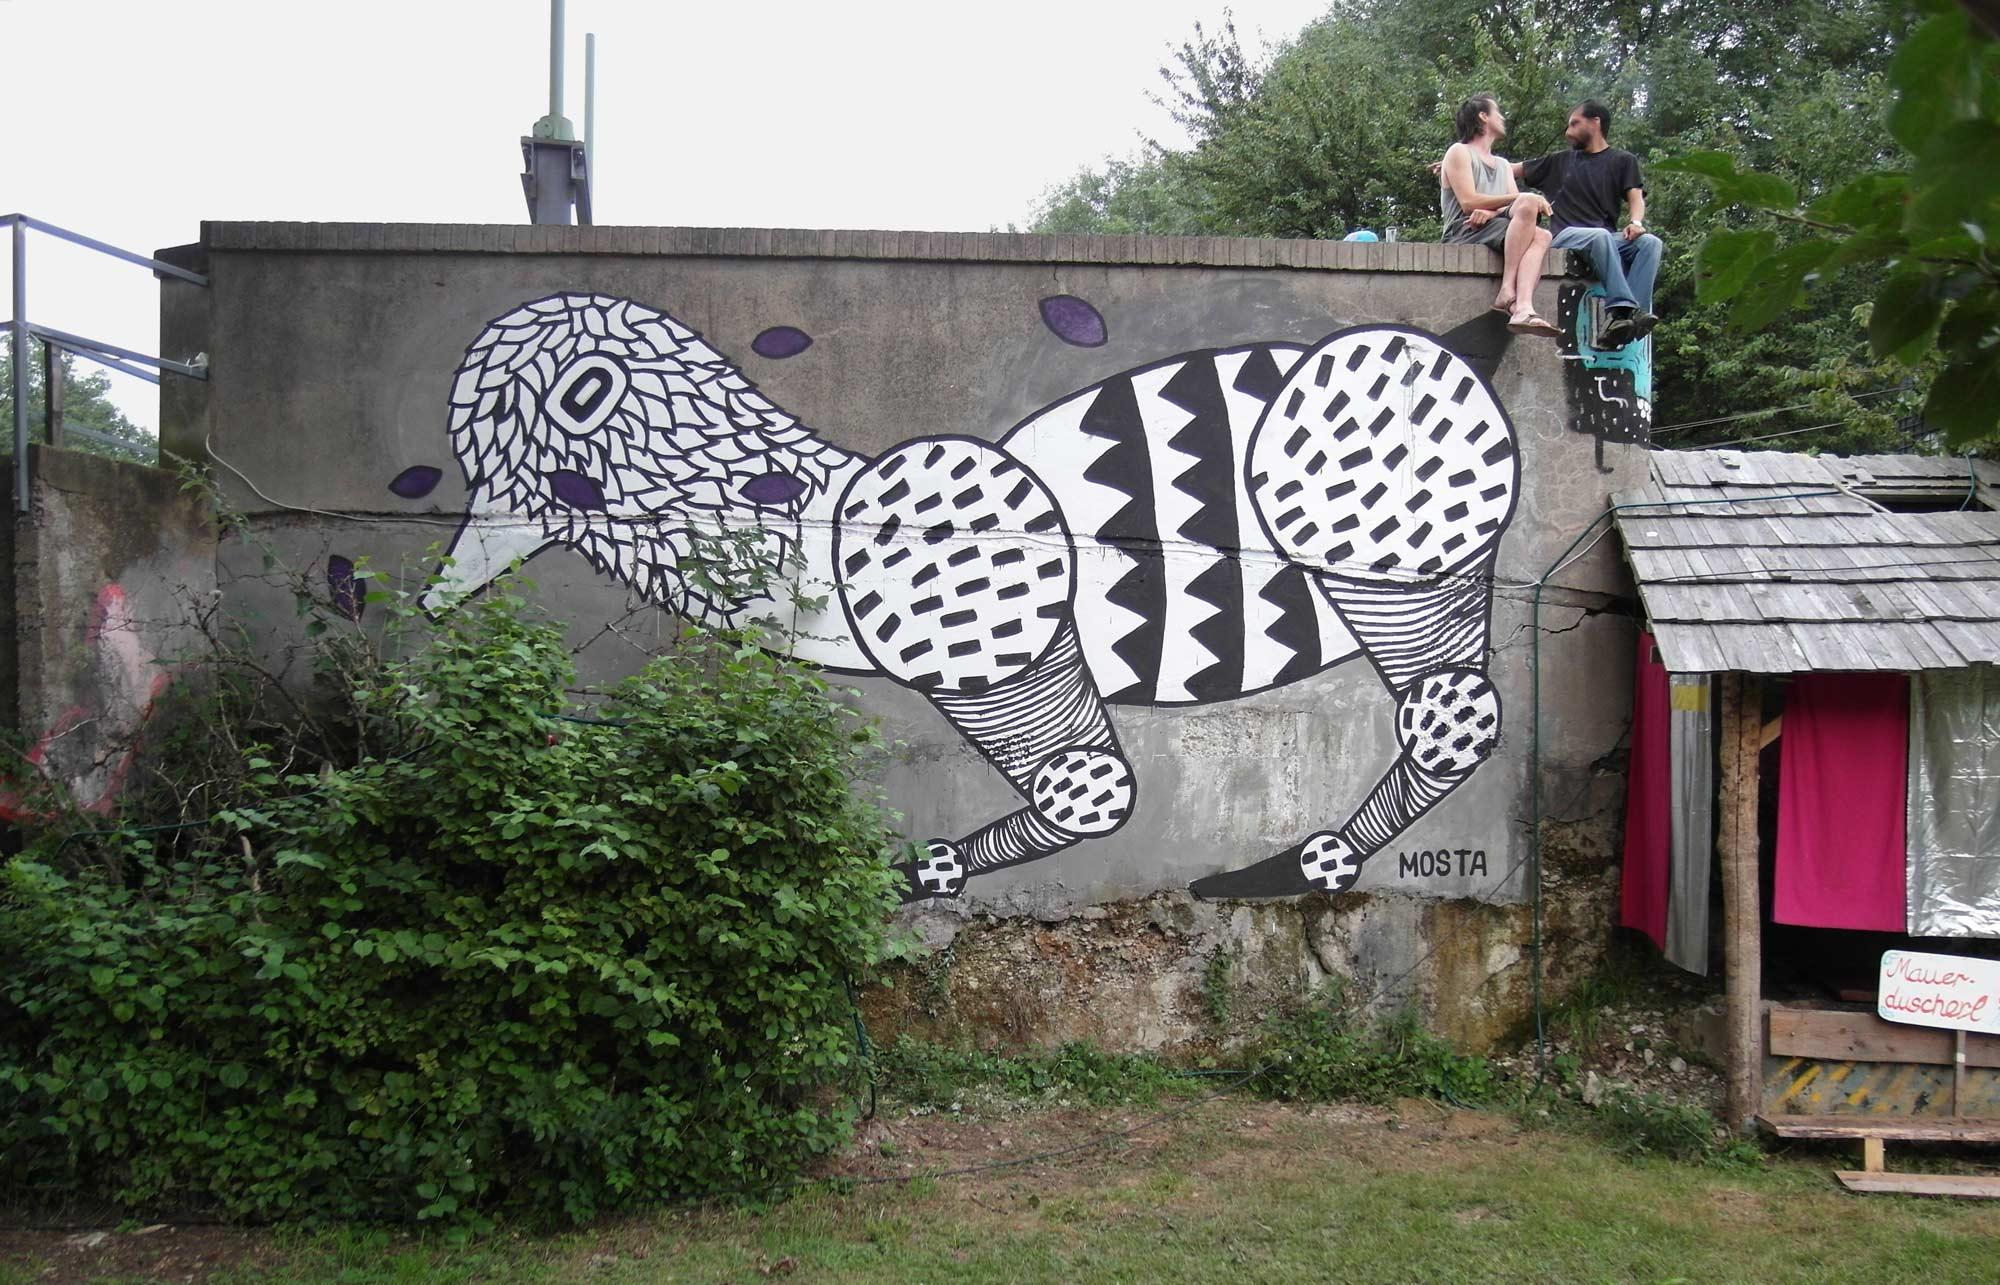 lym_moreno_murals_18